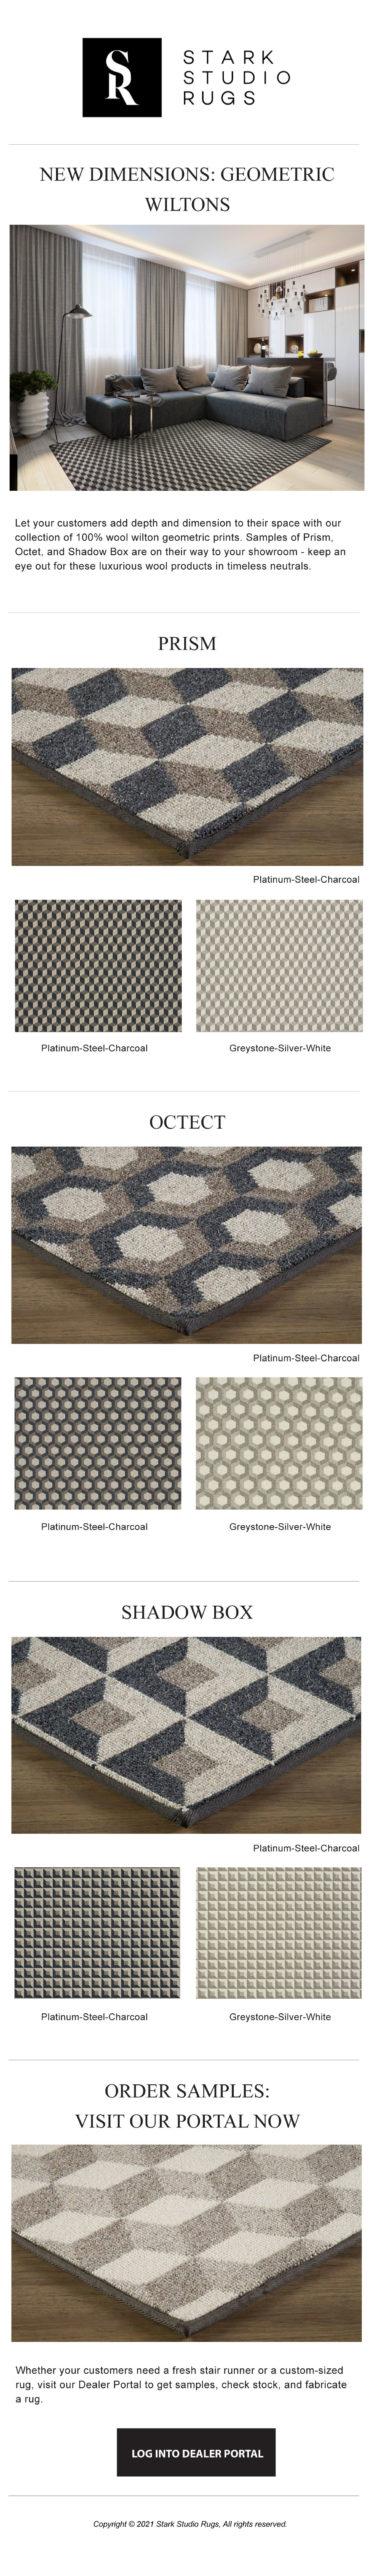 Wilton Highlight: New Geometric Wools